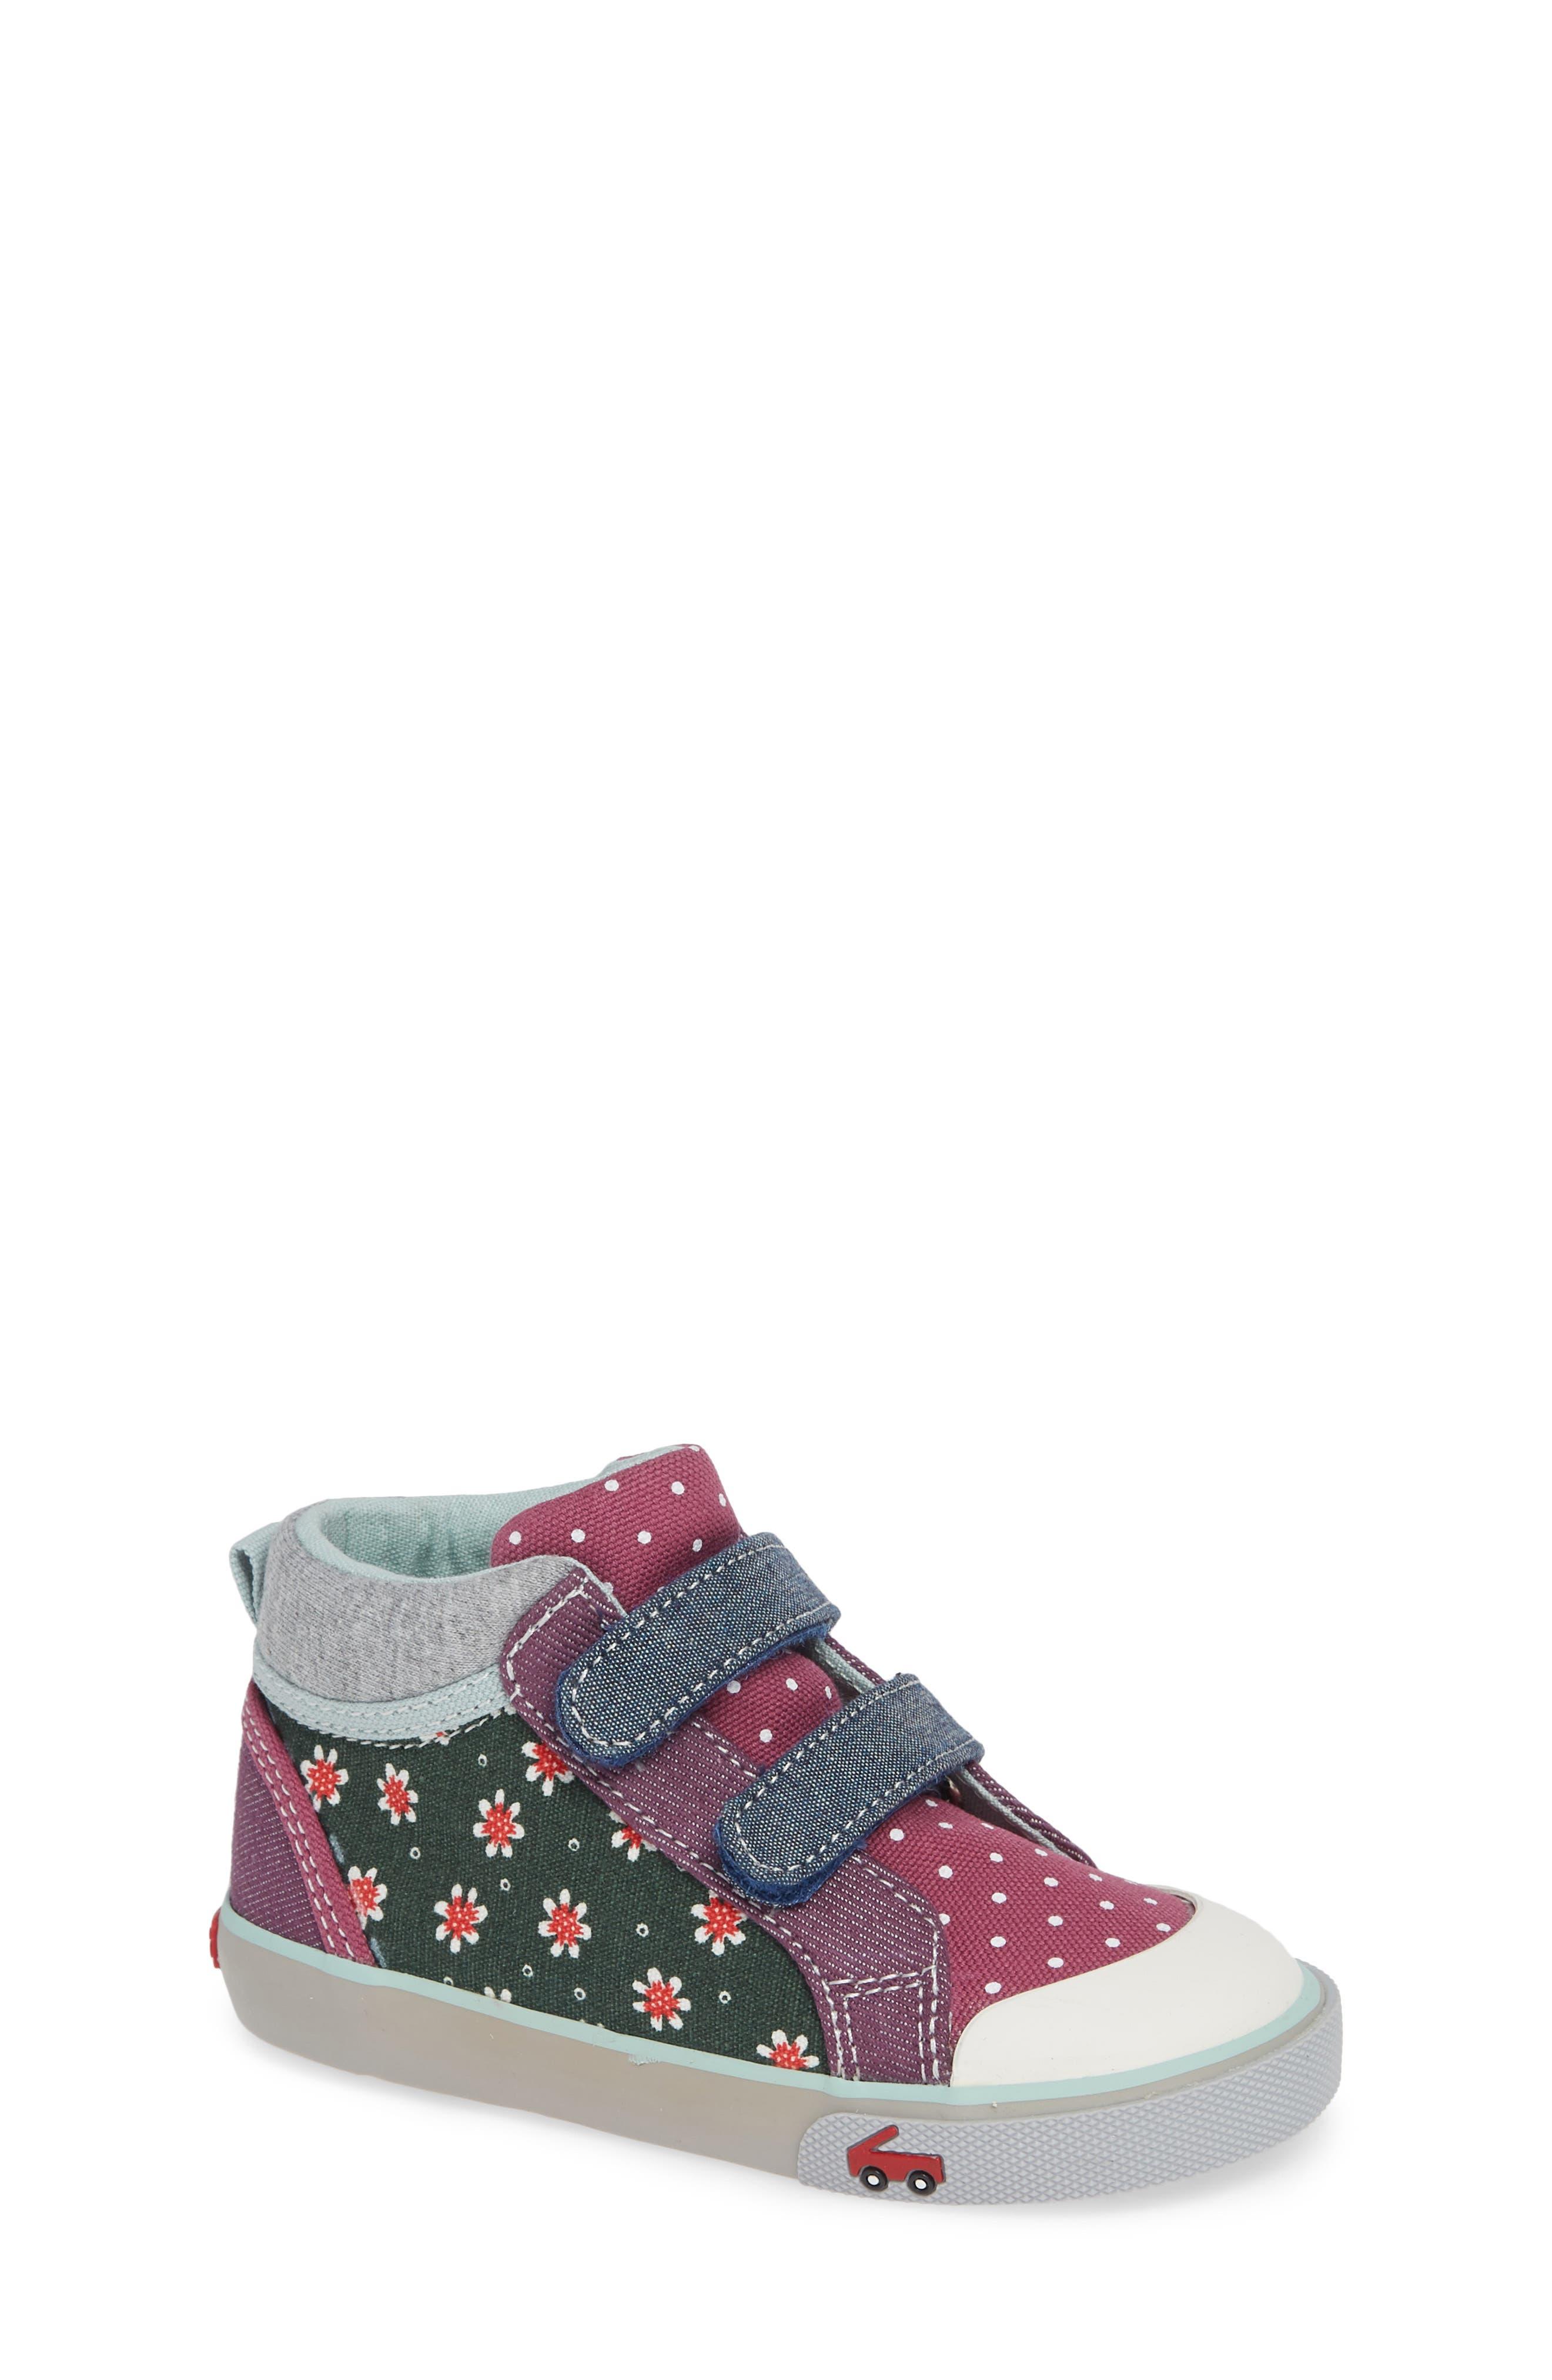 SEE KAI RUN, Kya Sneaker, Main thumbnail 1, color, GREEN FLORAL/MULTI